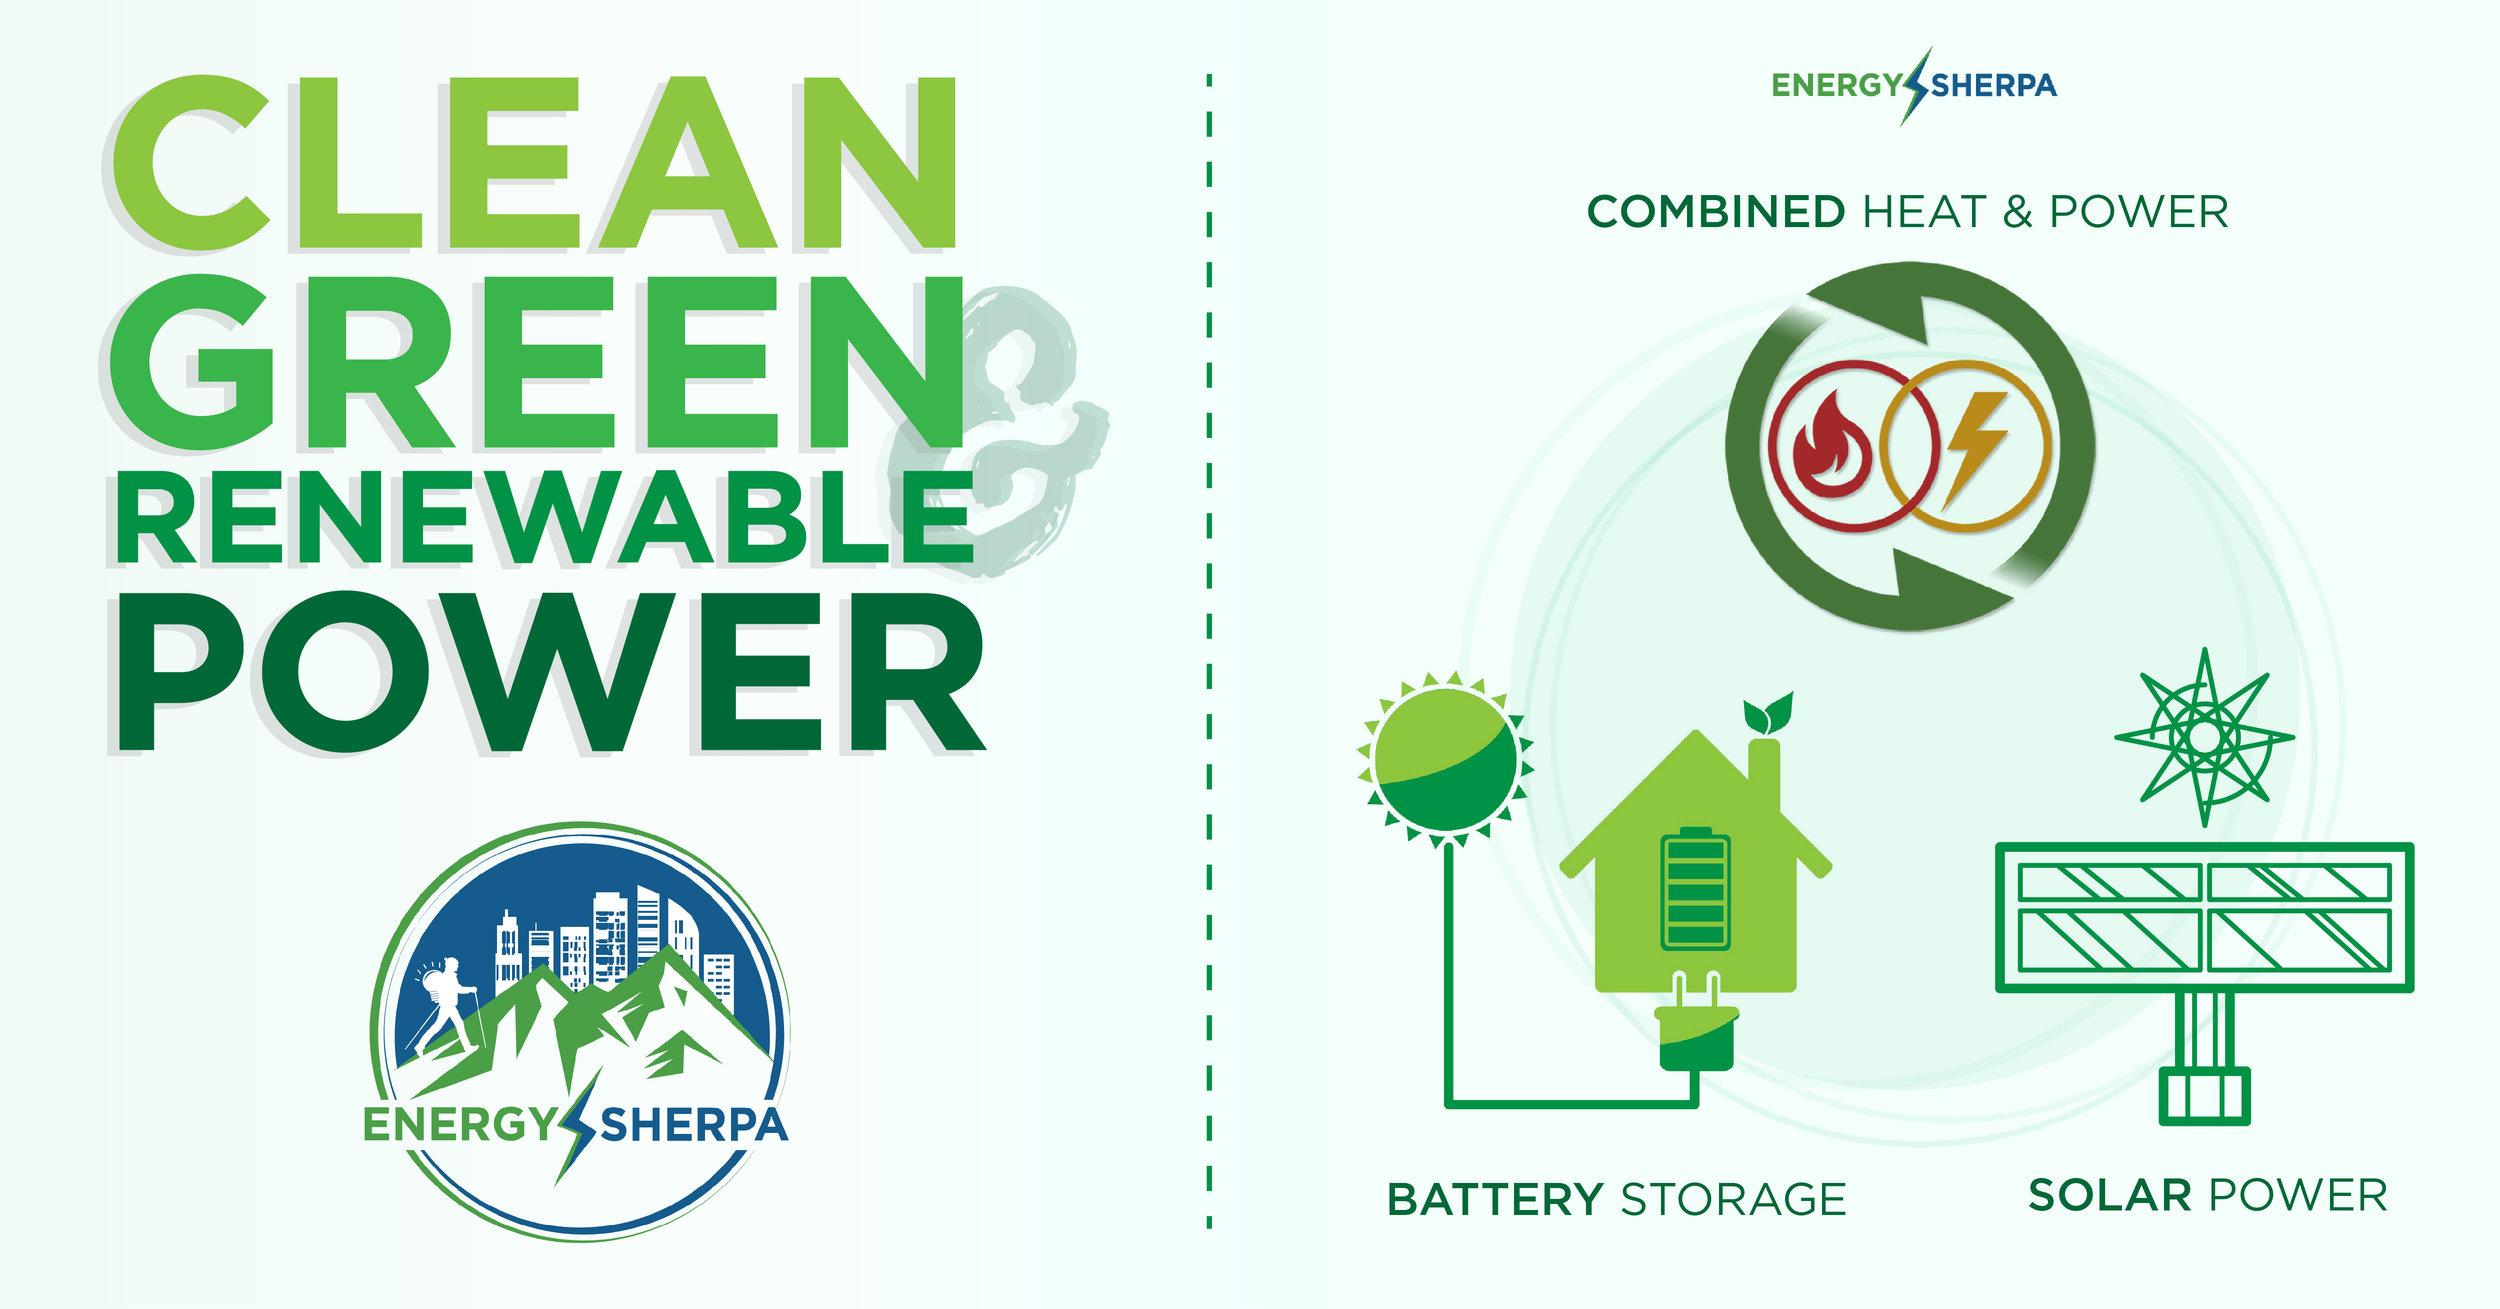 Clean,_Green,_Renewable_Power.jpg